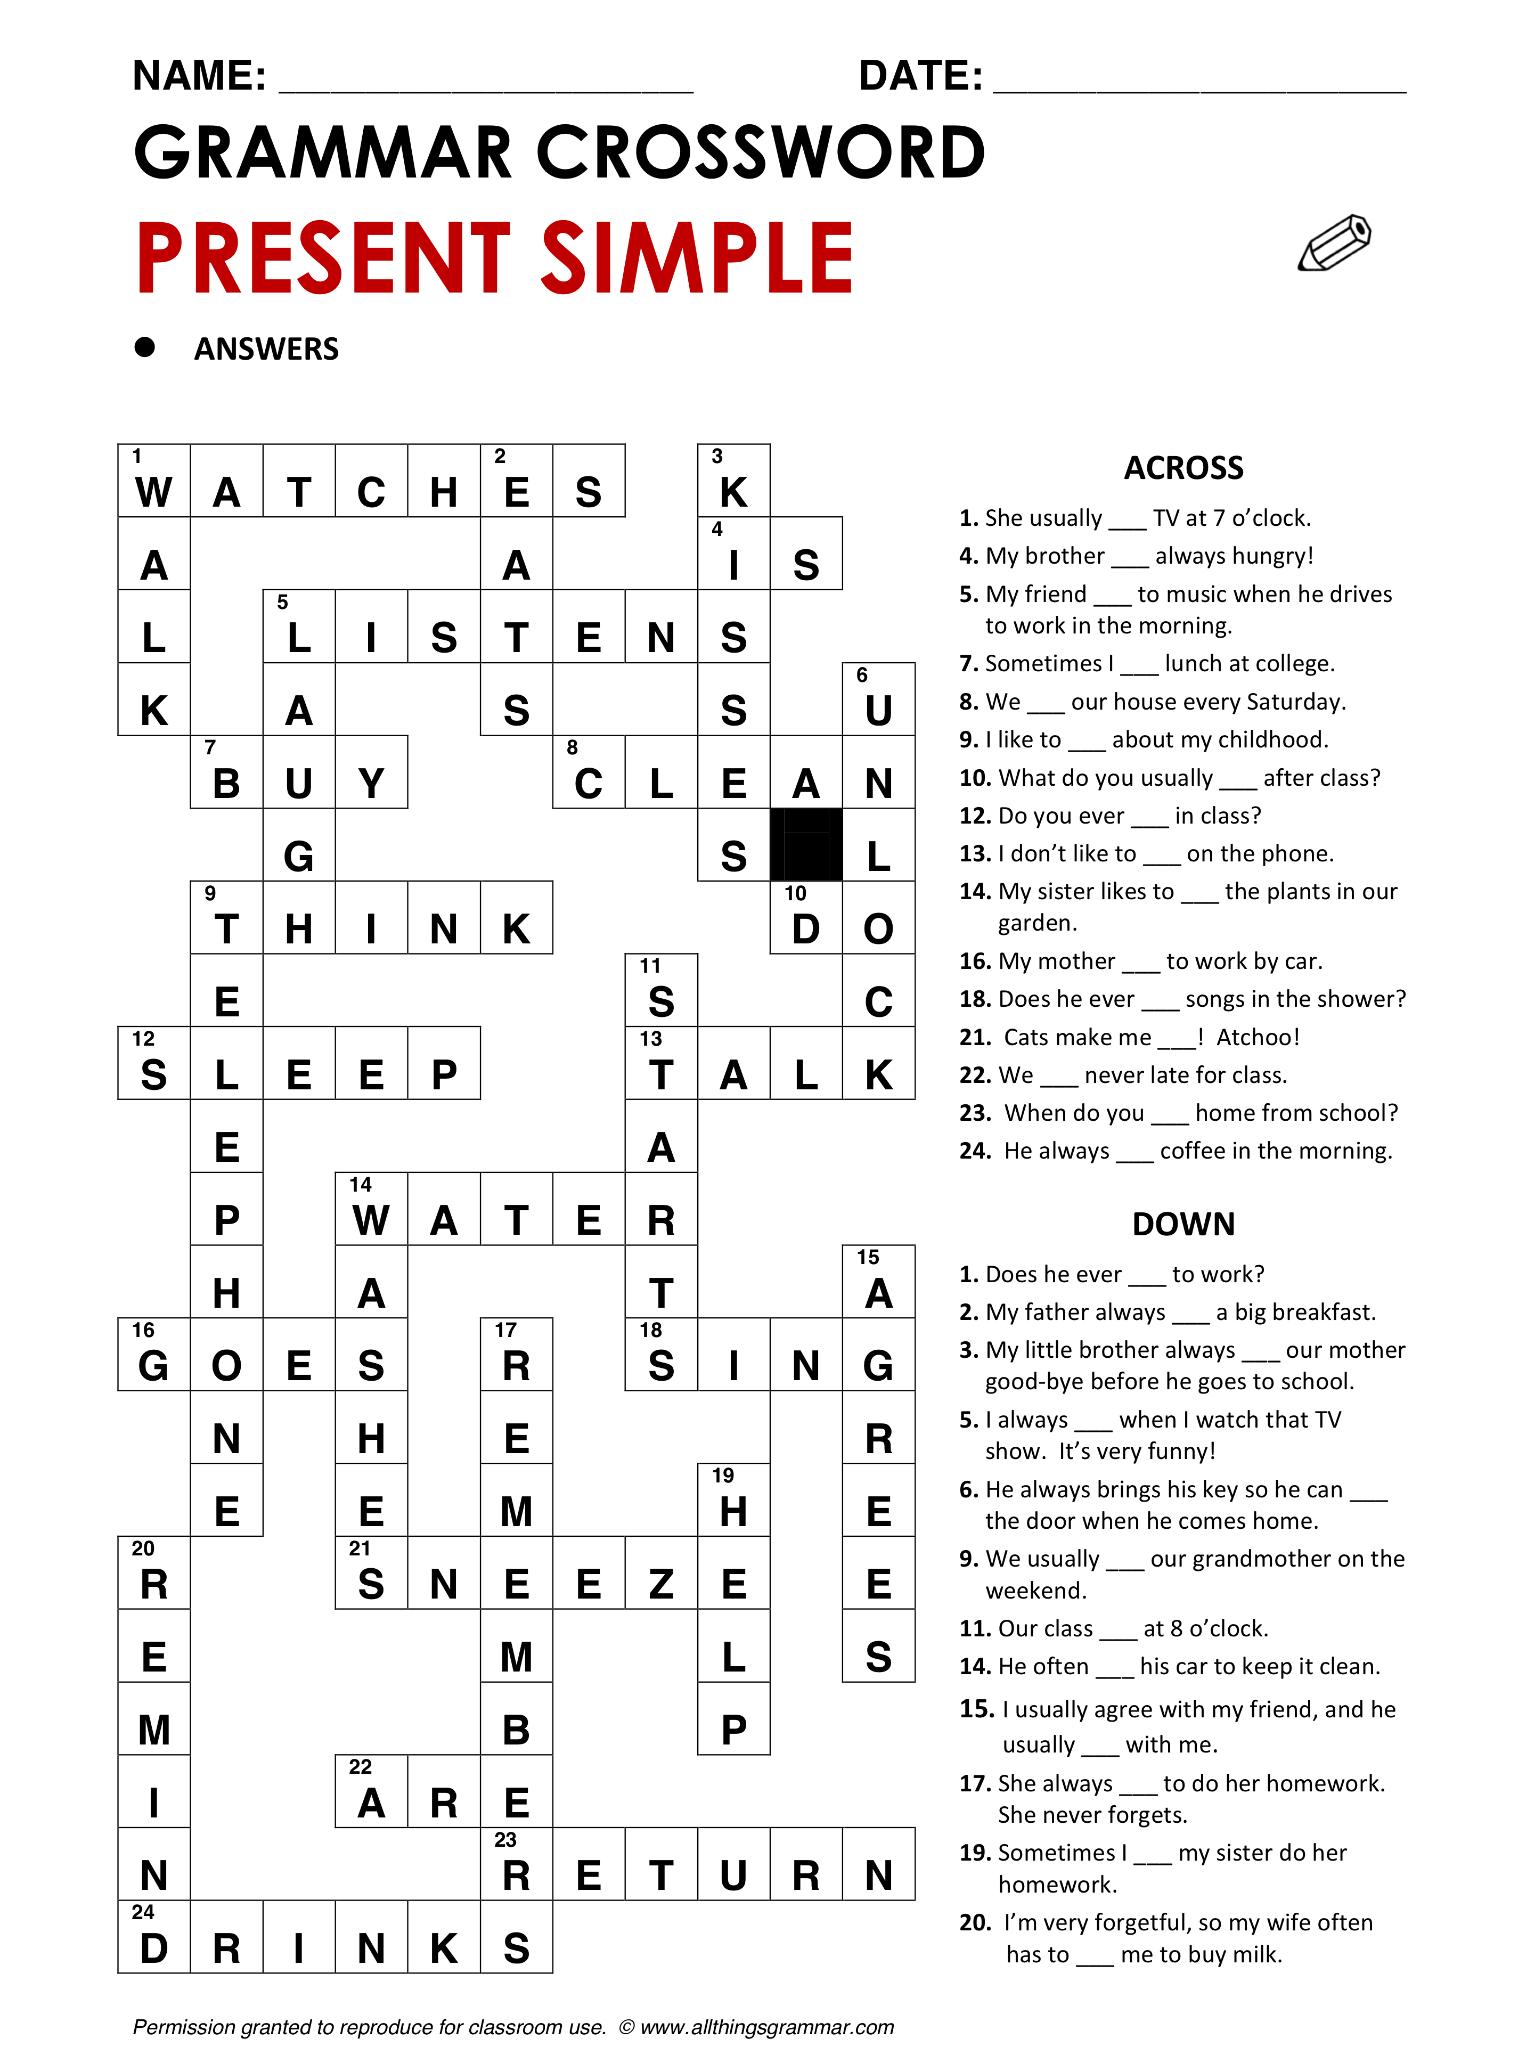 English Grammar Present Simple Lthingsgrammar